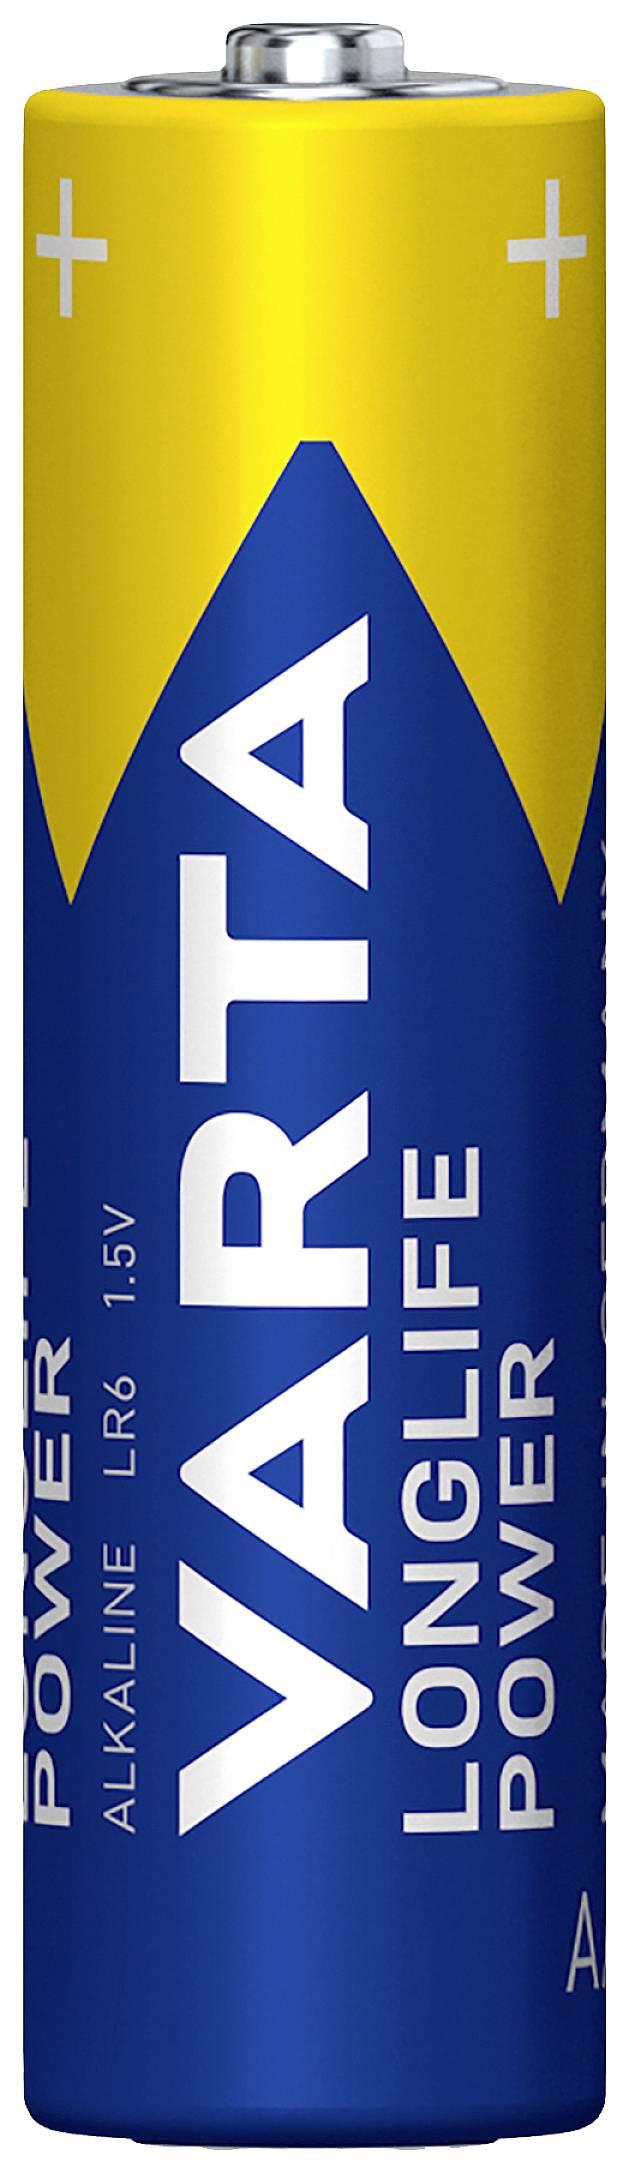 Batéria VARTA High Energy 4 ks, AA, 1,5 V